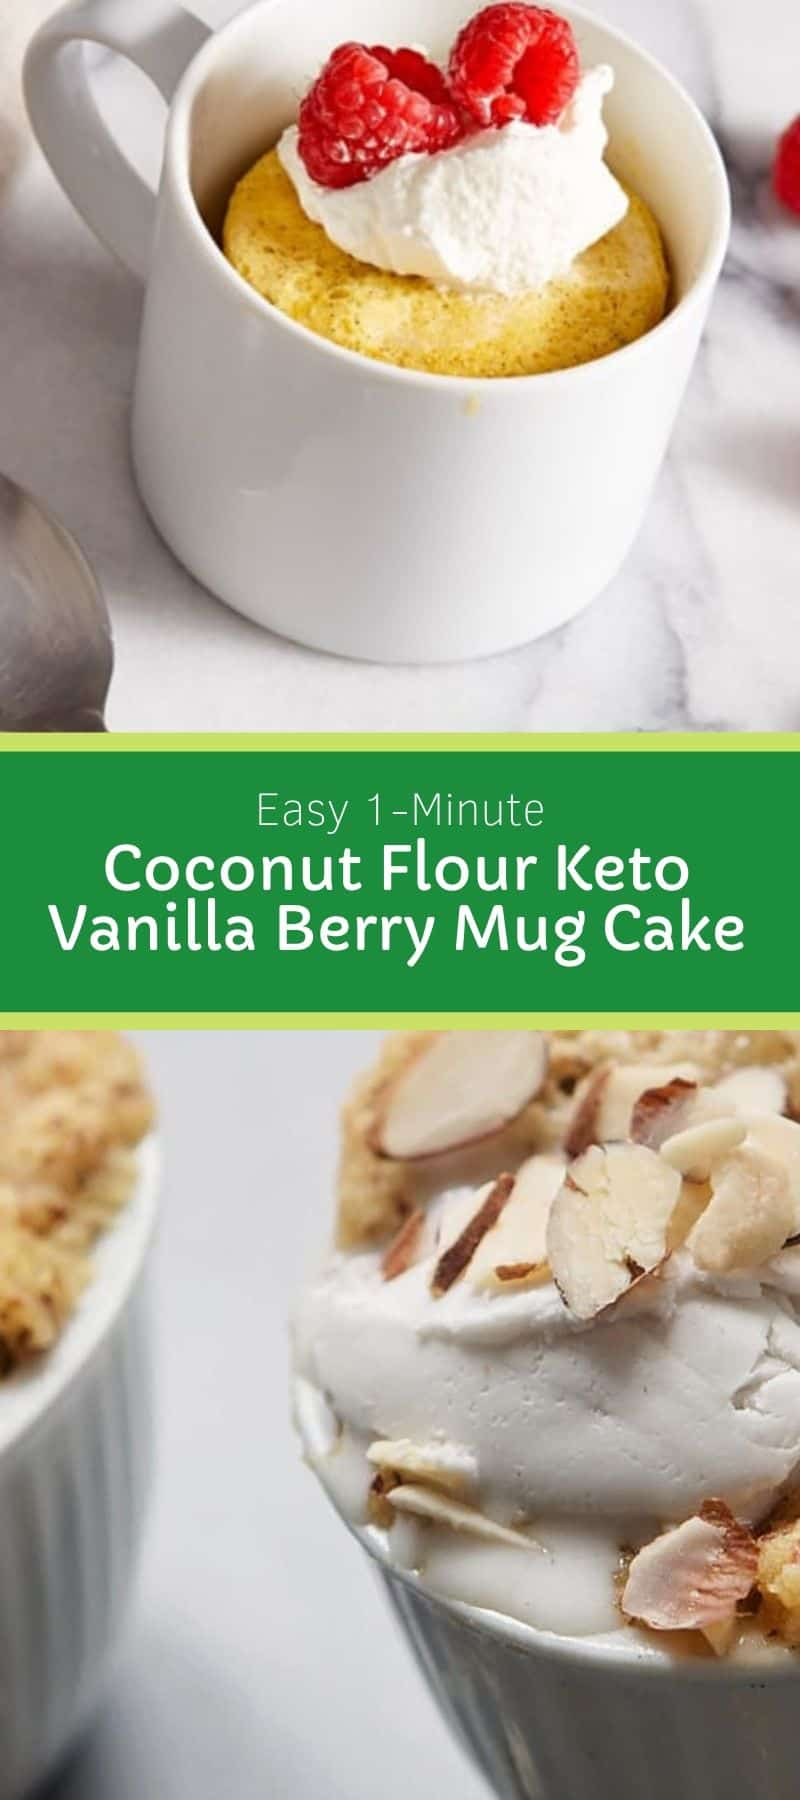 Easy 1-Minute Coconut Flour Keto Vanilla Berry Mug Cake 3